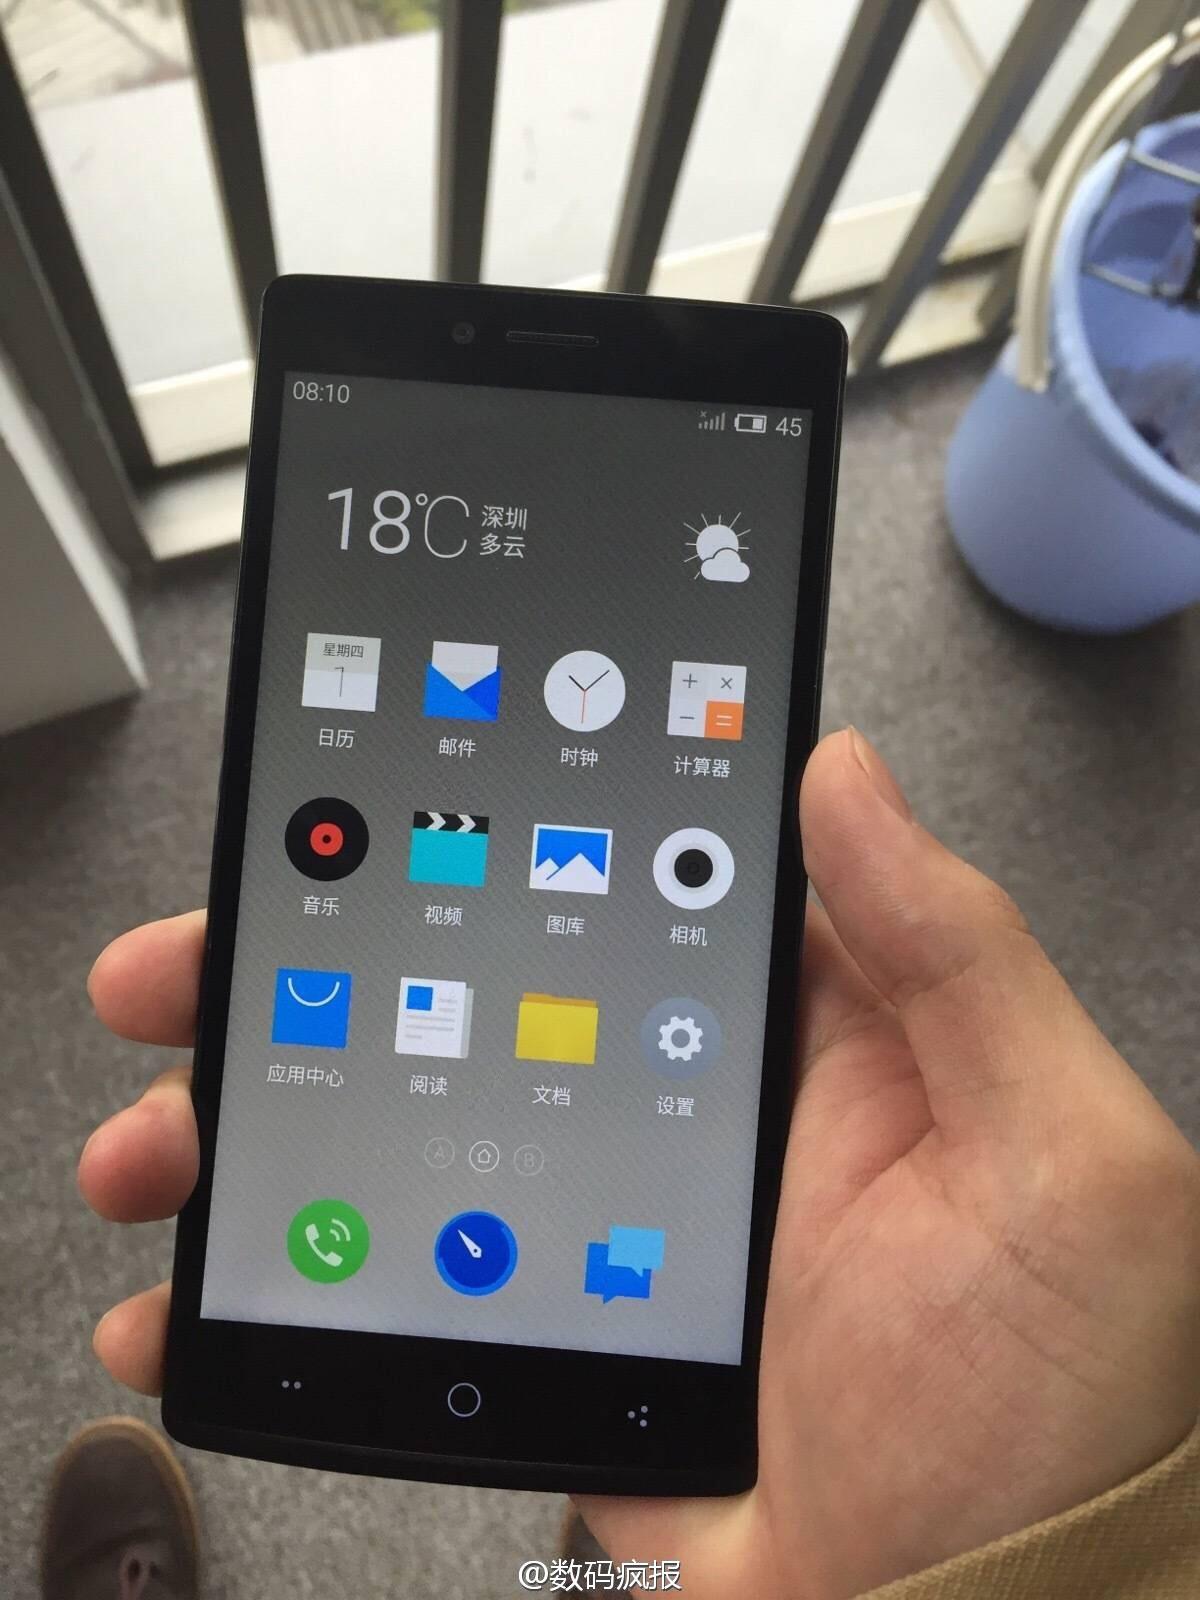 OnePlus 3 leaked image